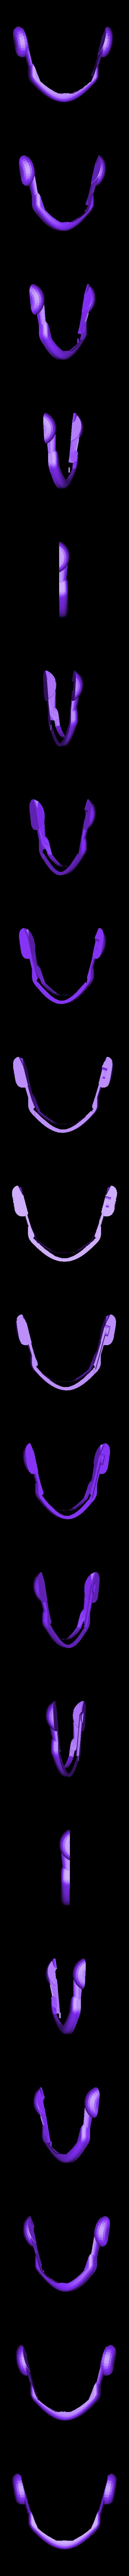 Kid-Visor_Upper.stl Télécharger fichier STL gratuit Visière Cyclope 90's • Objet à imprimer en 3D, Fayeya